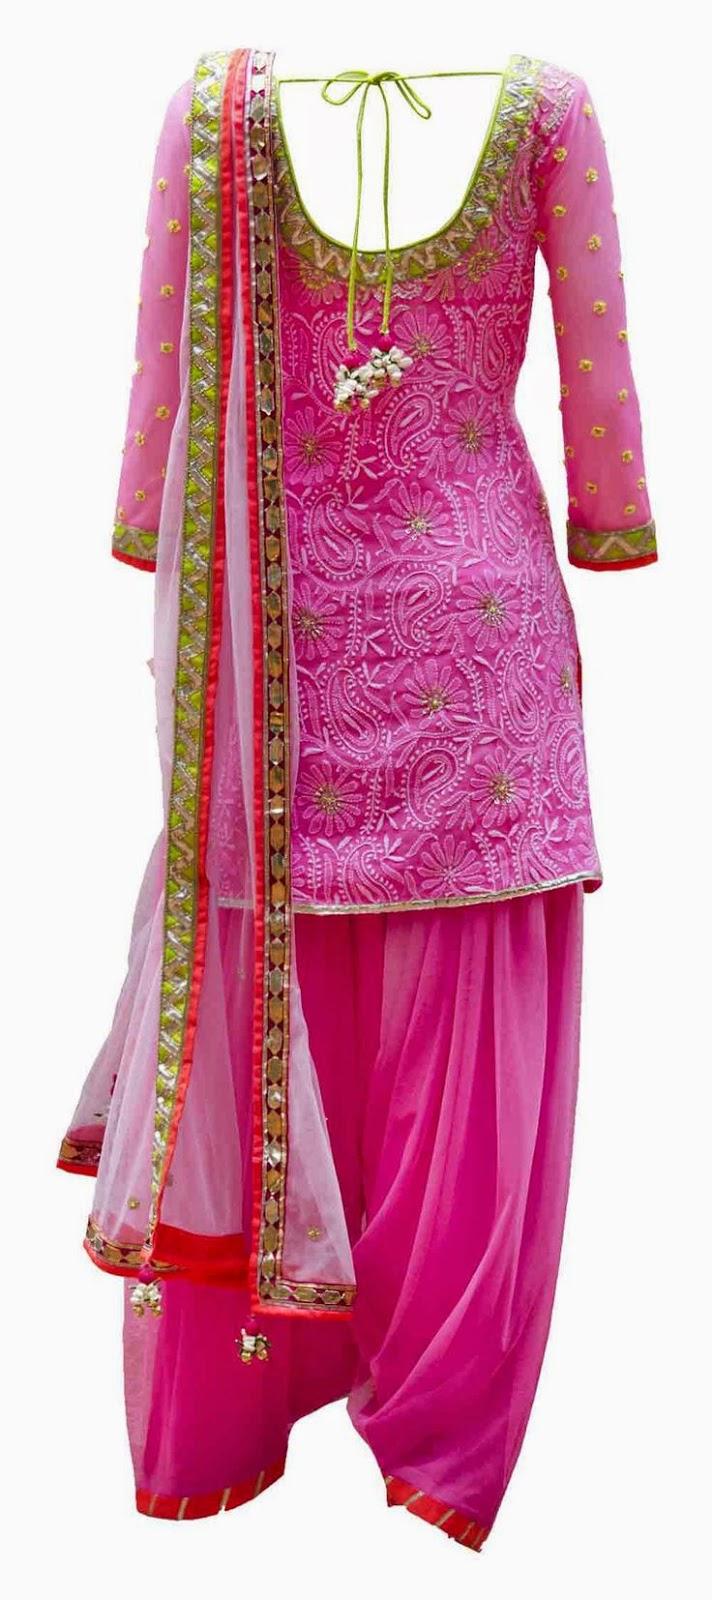 22 part 3 punjabi bhabhi in salwar suit selfie wid moans 4